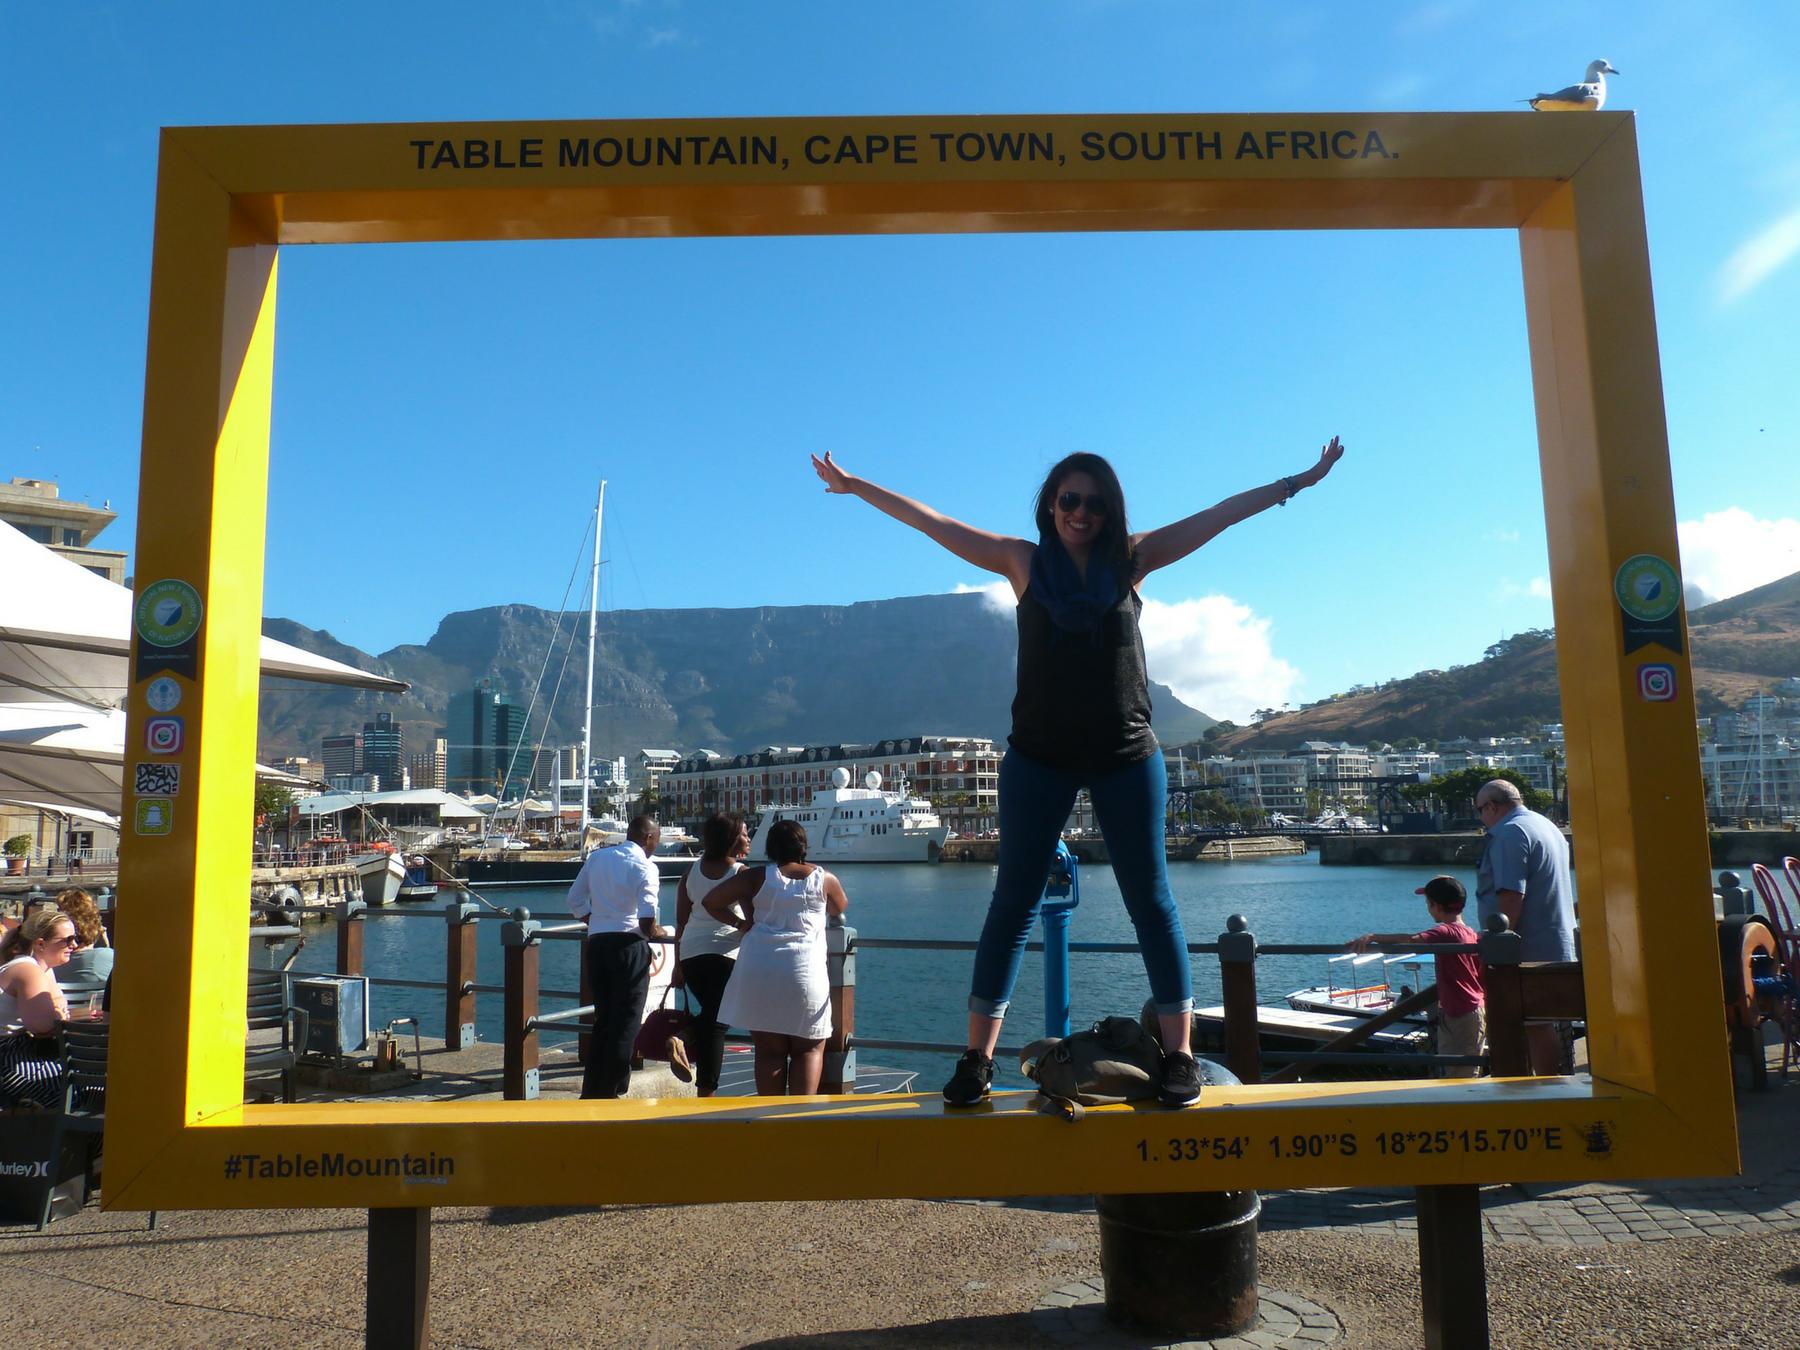 Roteiro-Cidade-do-Cabo-4-a-7-dias-vea-waterfront Roteiro Cidade do Cabo 4 a 7 dias (Sensacional)!